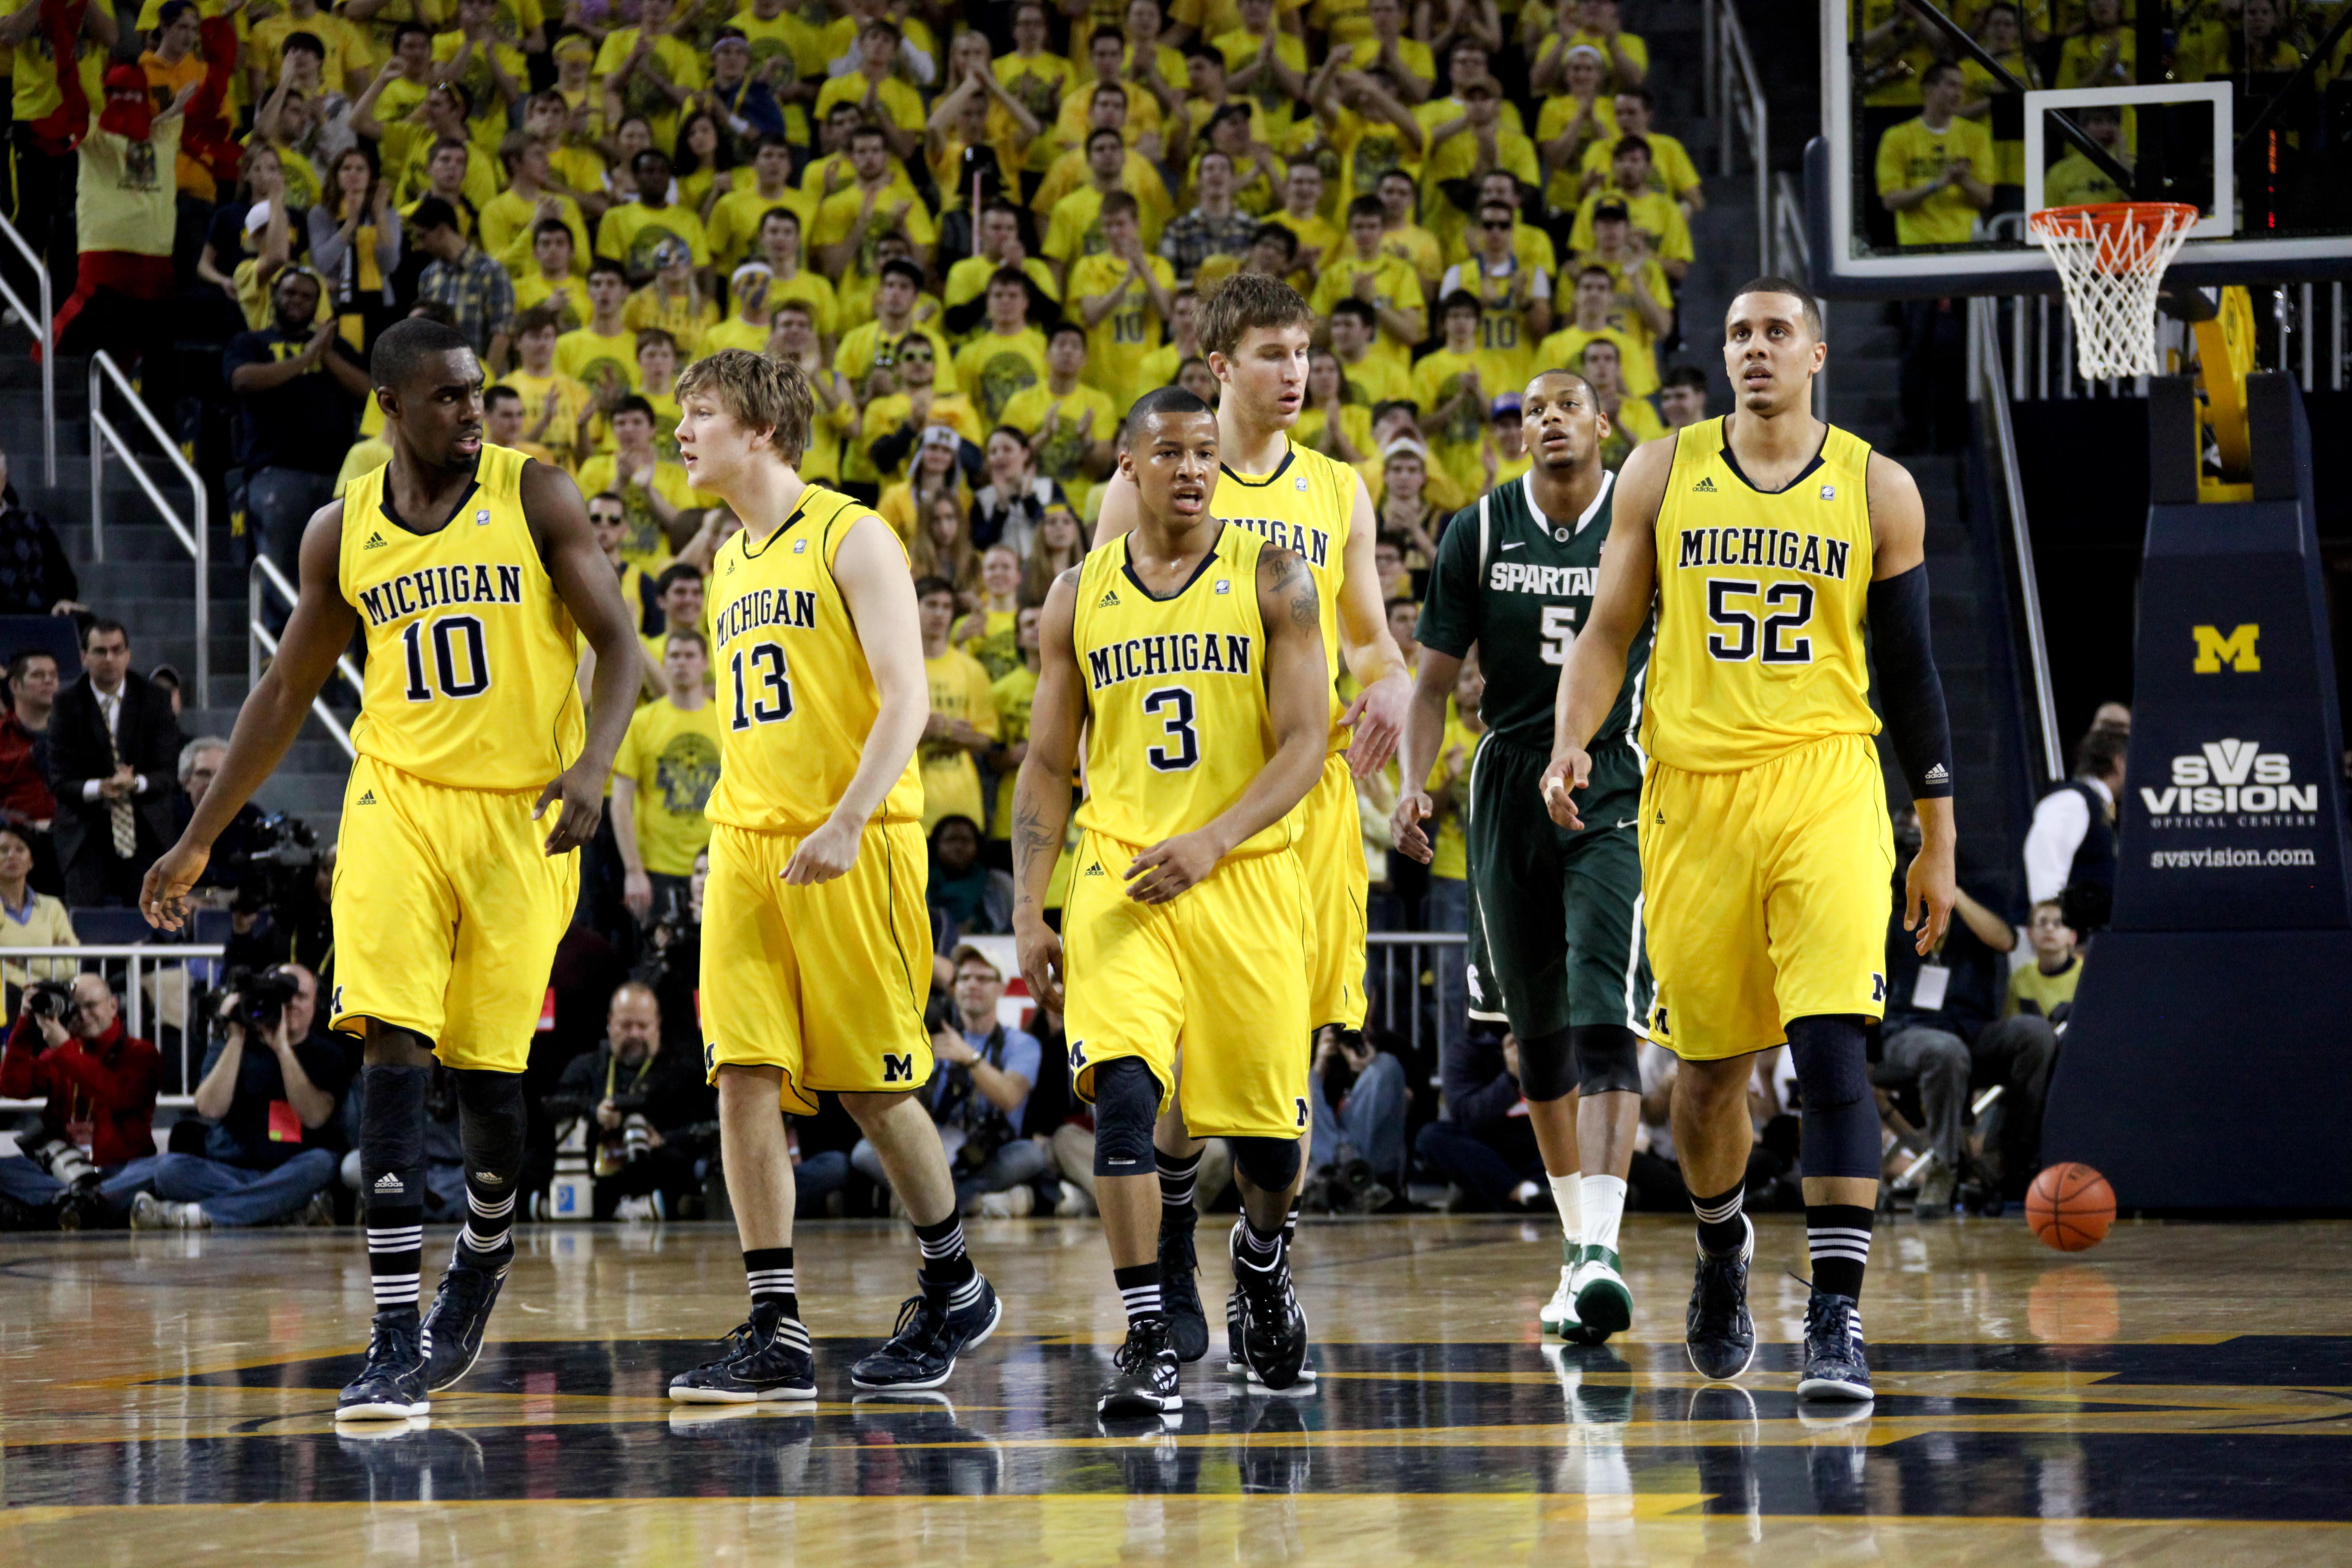 Michigan State at Michigan 5